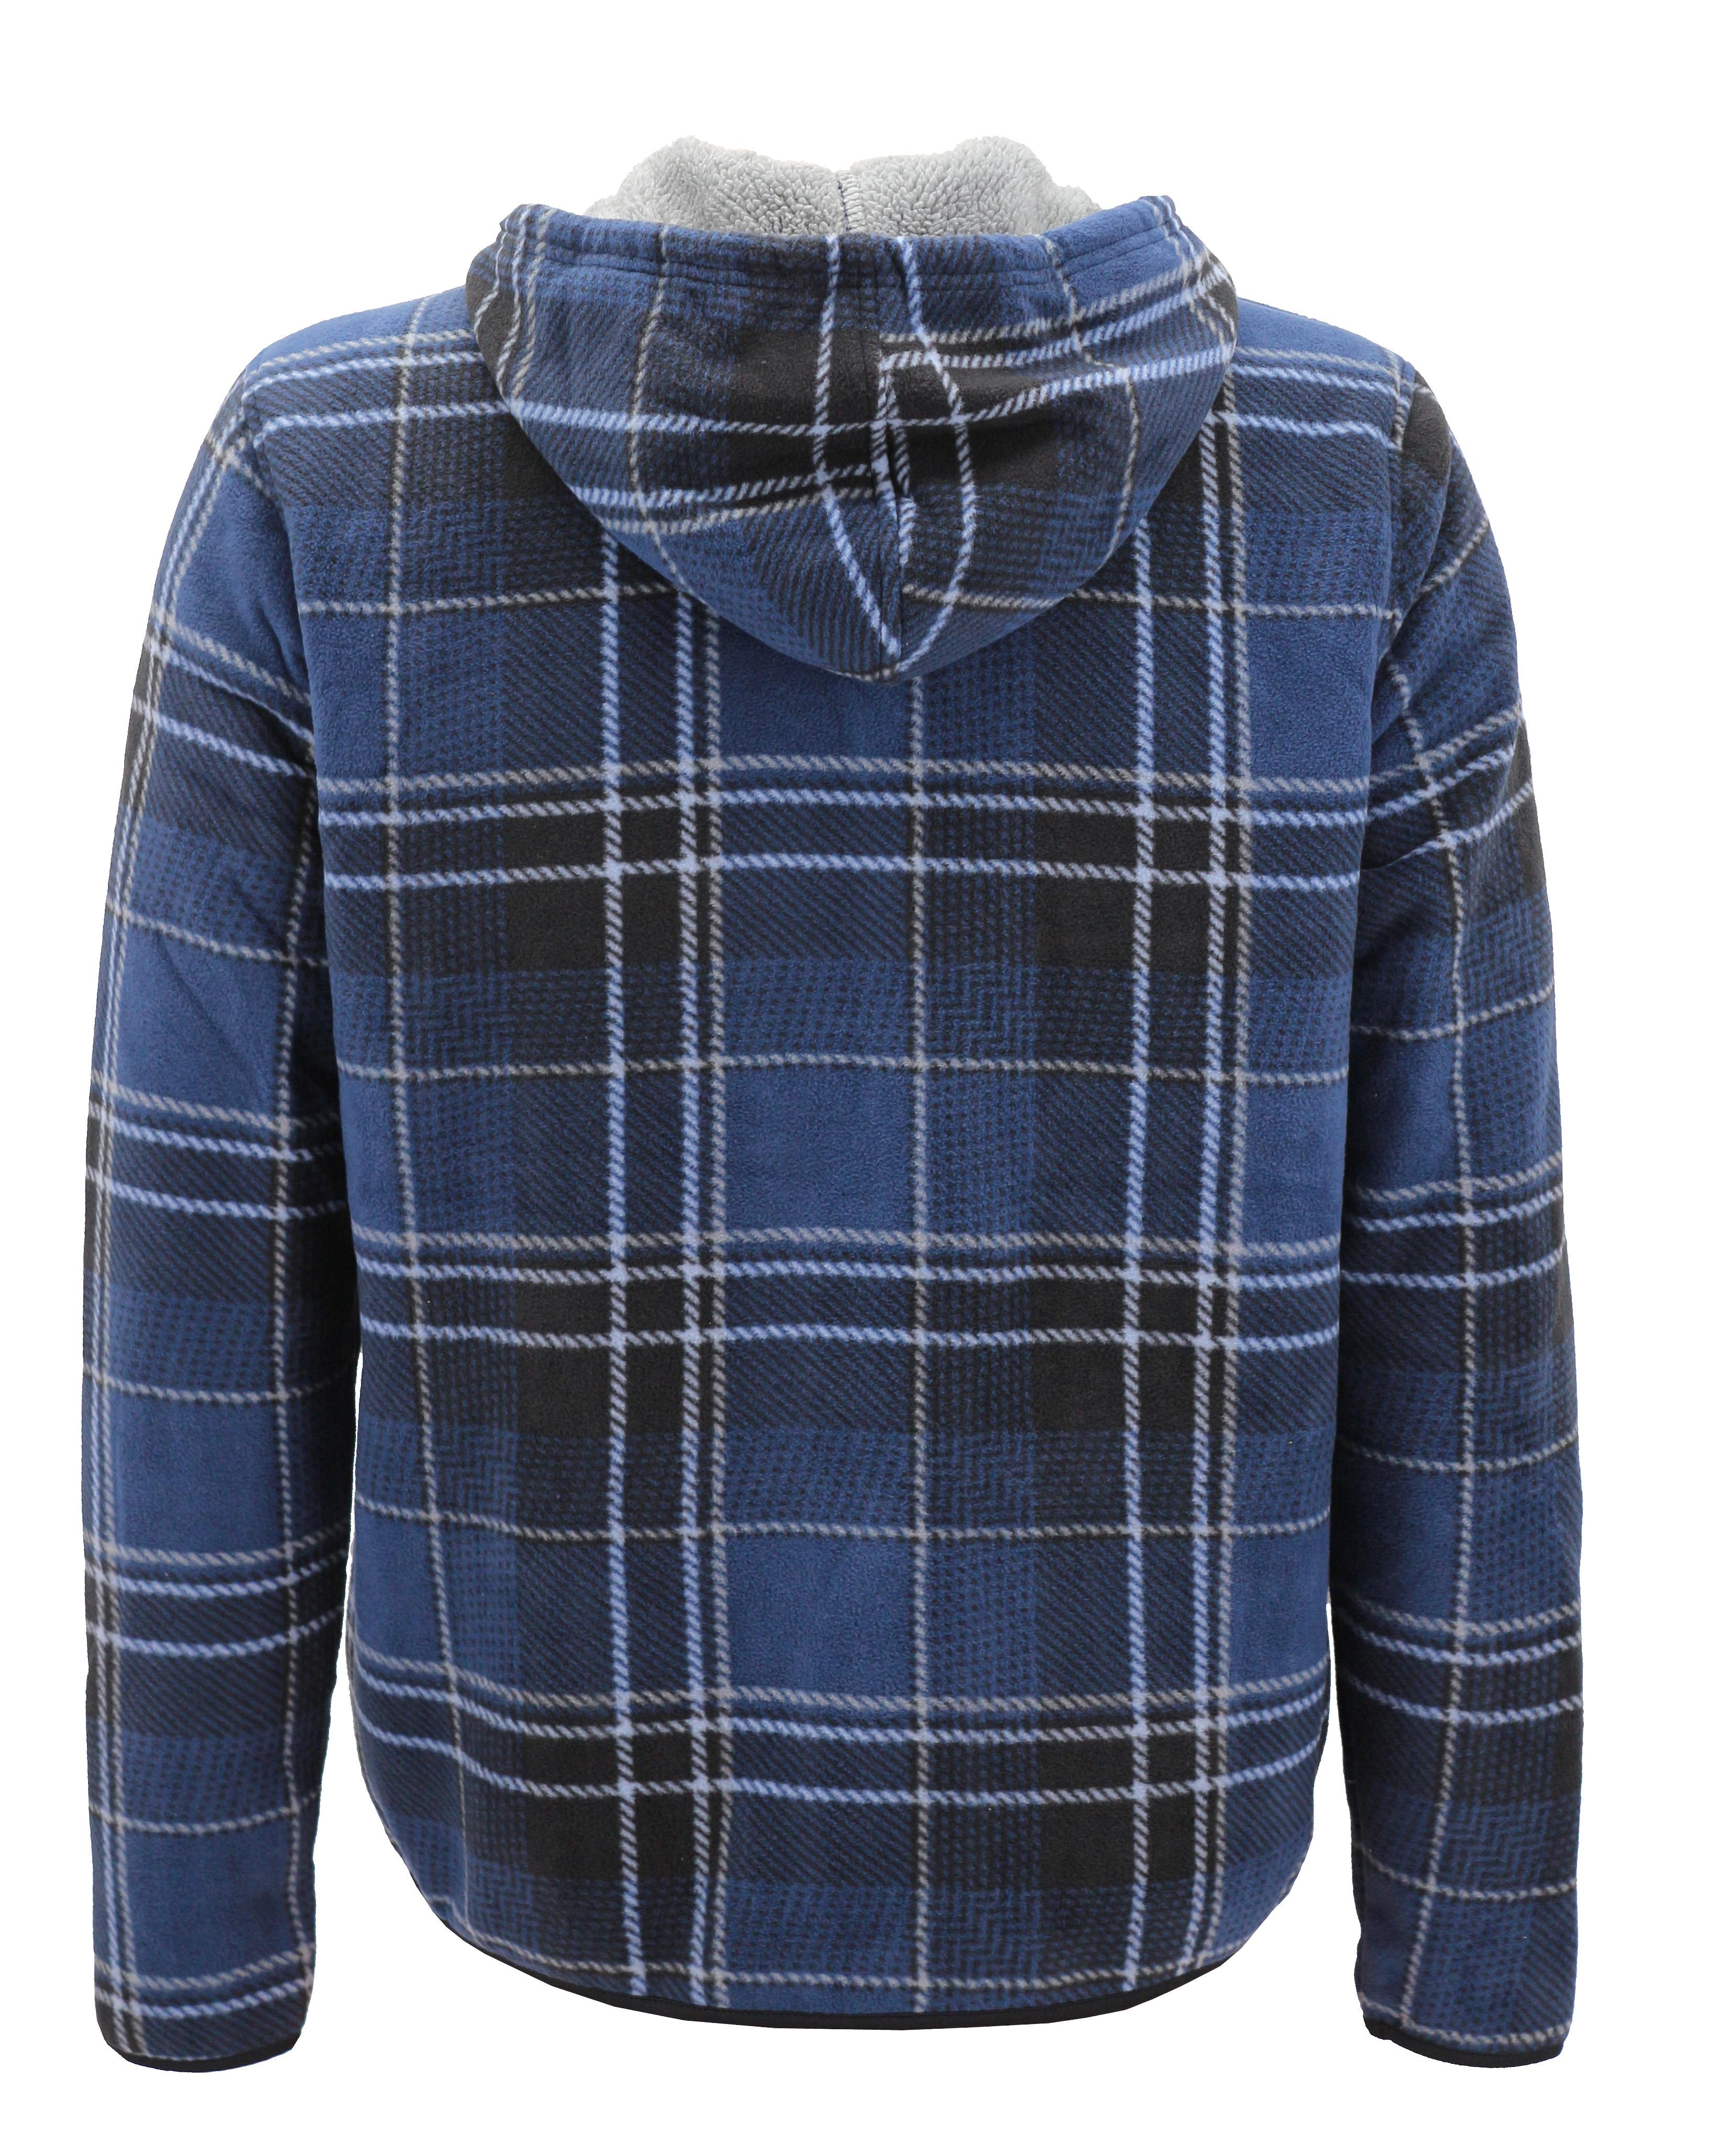 Men-039-s-Casual-Flannel-Zip-Up-Fleece-Lined-Plaid-Sherpa-Hoodie-Lightweight-Jacket thumbnail 18